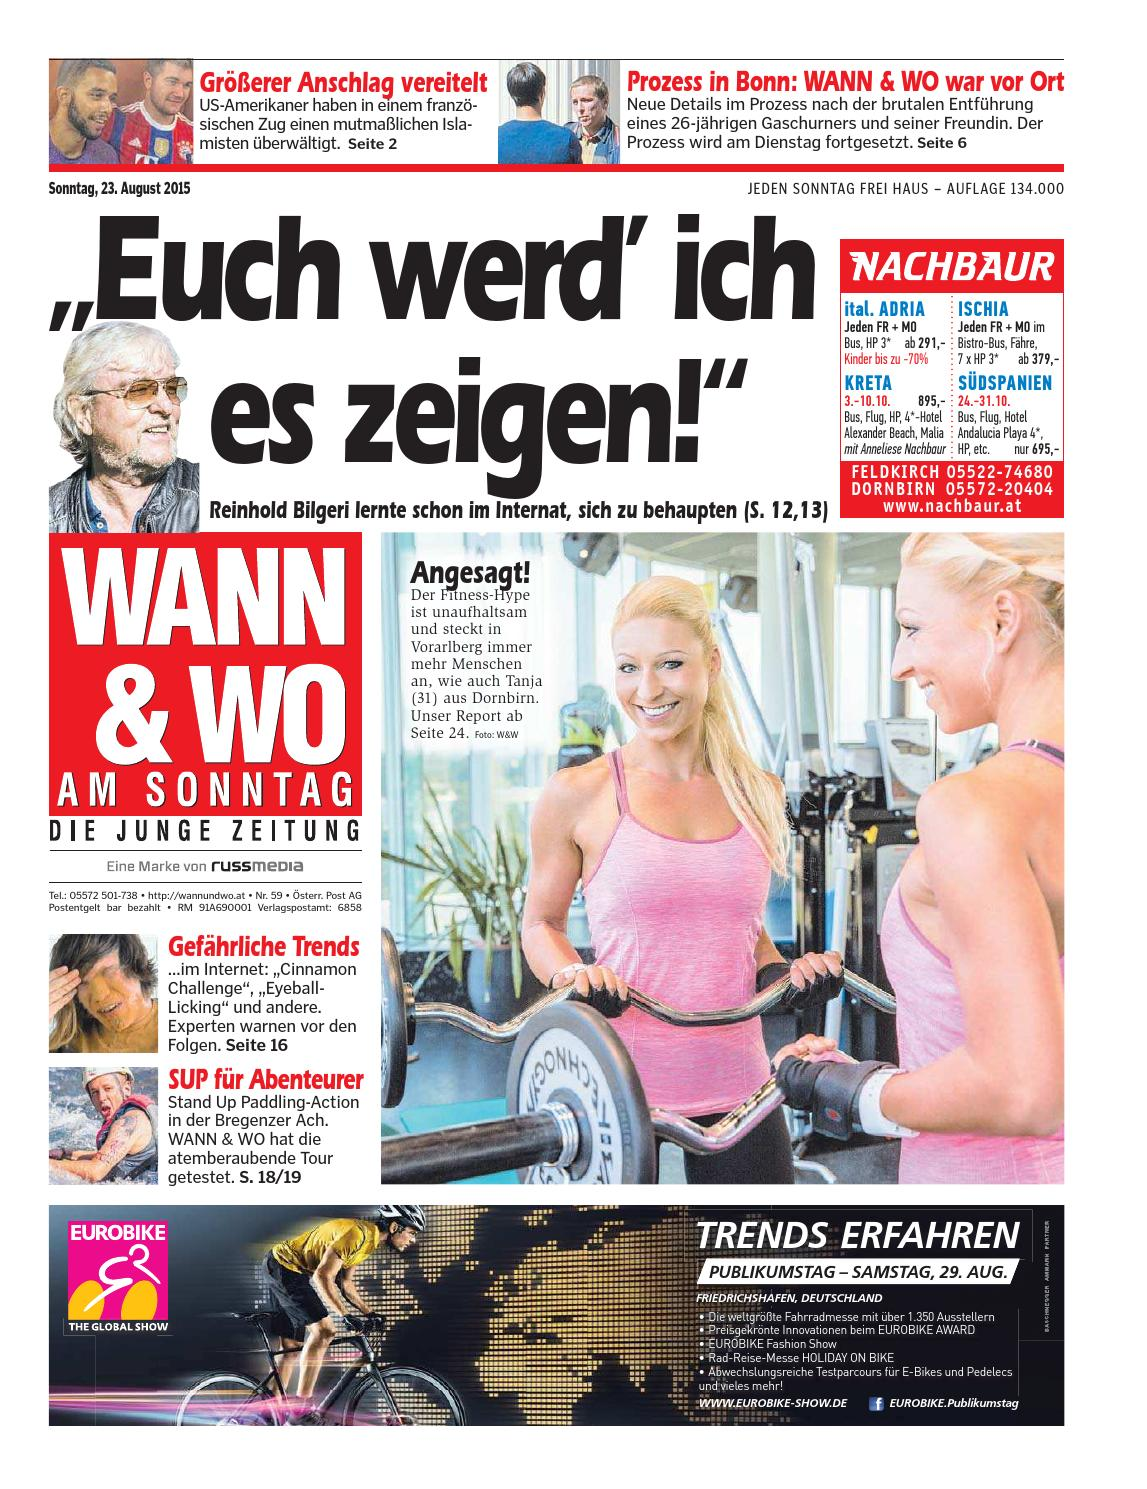 Kontaktanzeigen Feldkirch | Locanto Dating Feldkirch